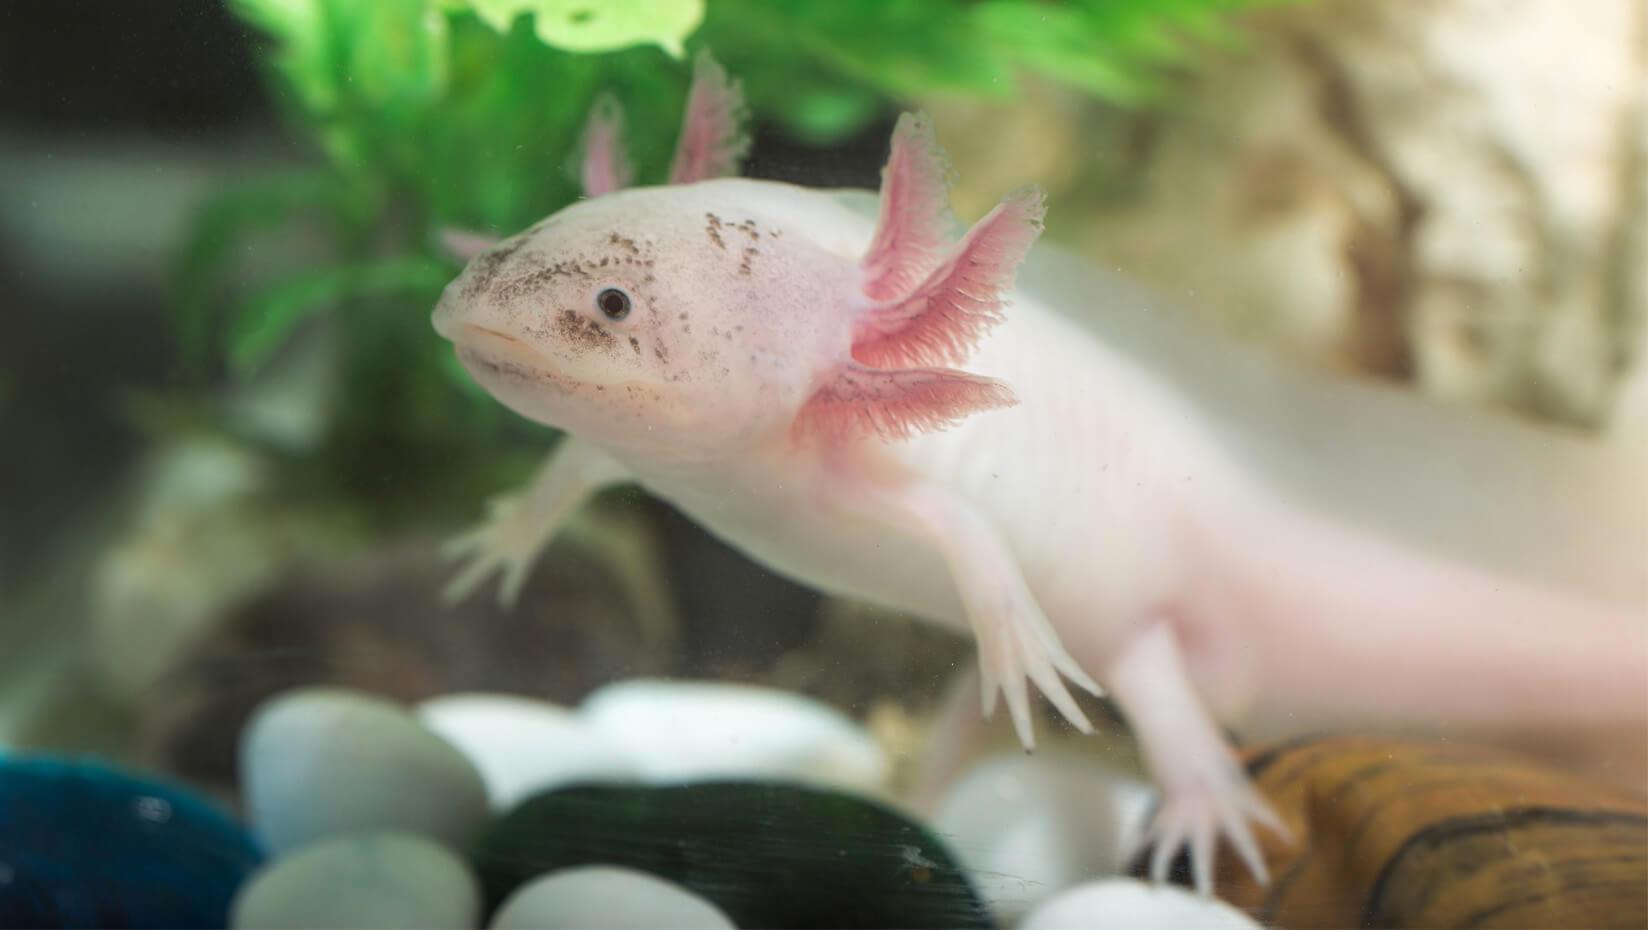 umaine ben king research biomedical axolotl-salamander